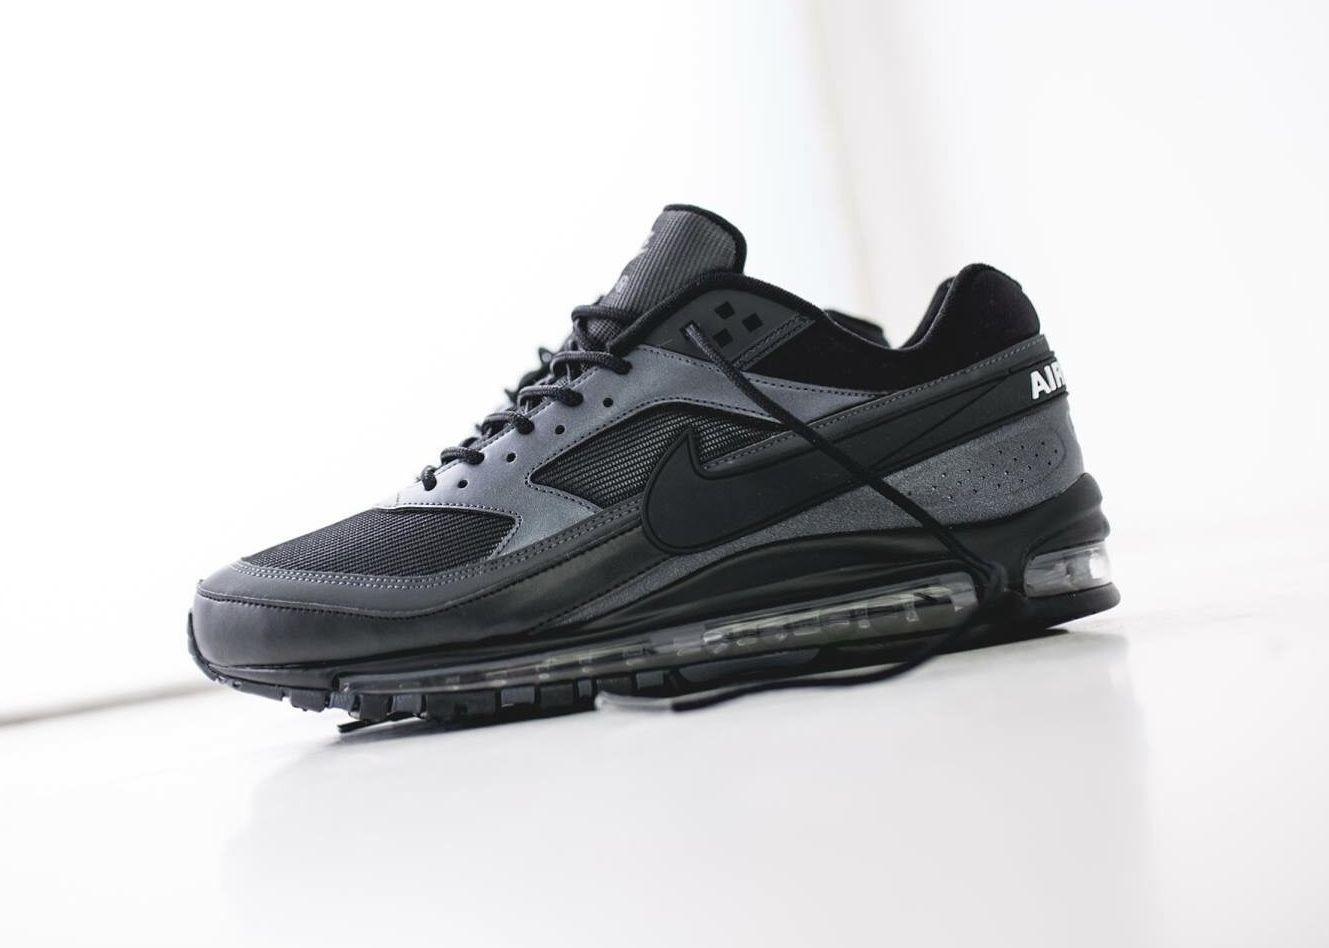 online retailer a741e ab5b8 Hip Hop Fashion. Nike Air Max 97 BW Air Max 97, Nike Air Max, Air Max